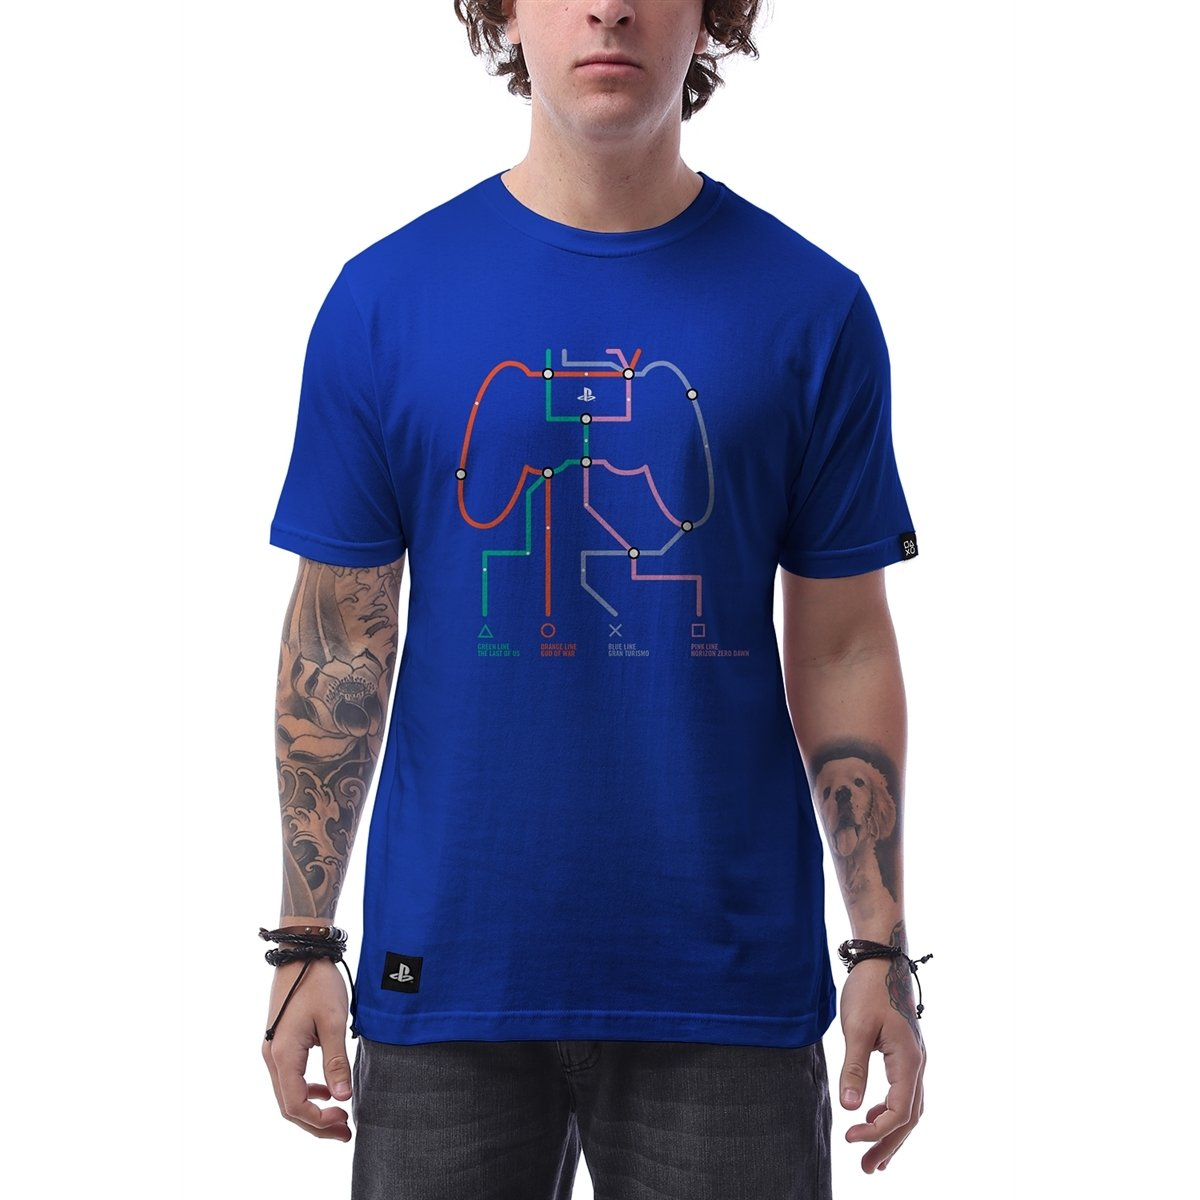 fa632c1bf2 Camiseta Playstation Play Lines Masculina - Azul - Compre Agora ...